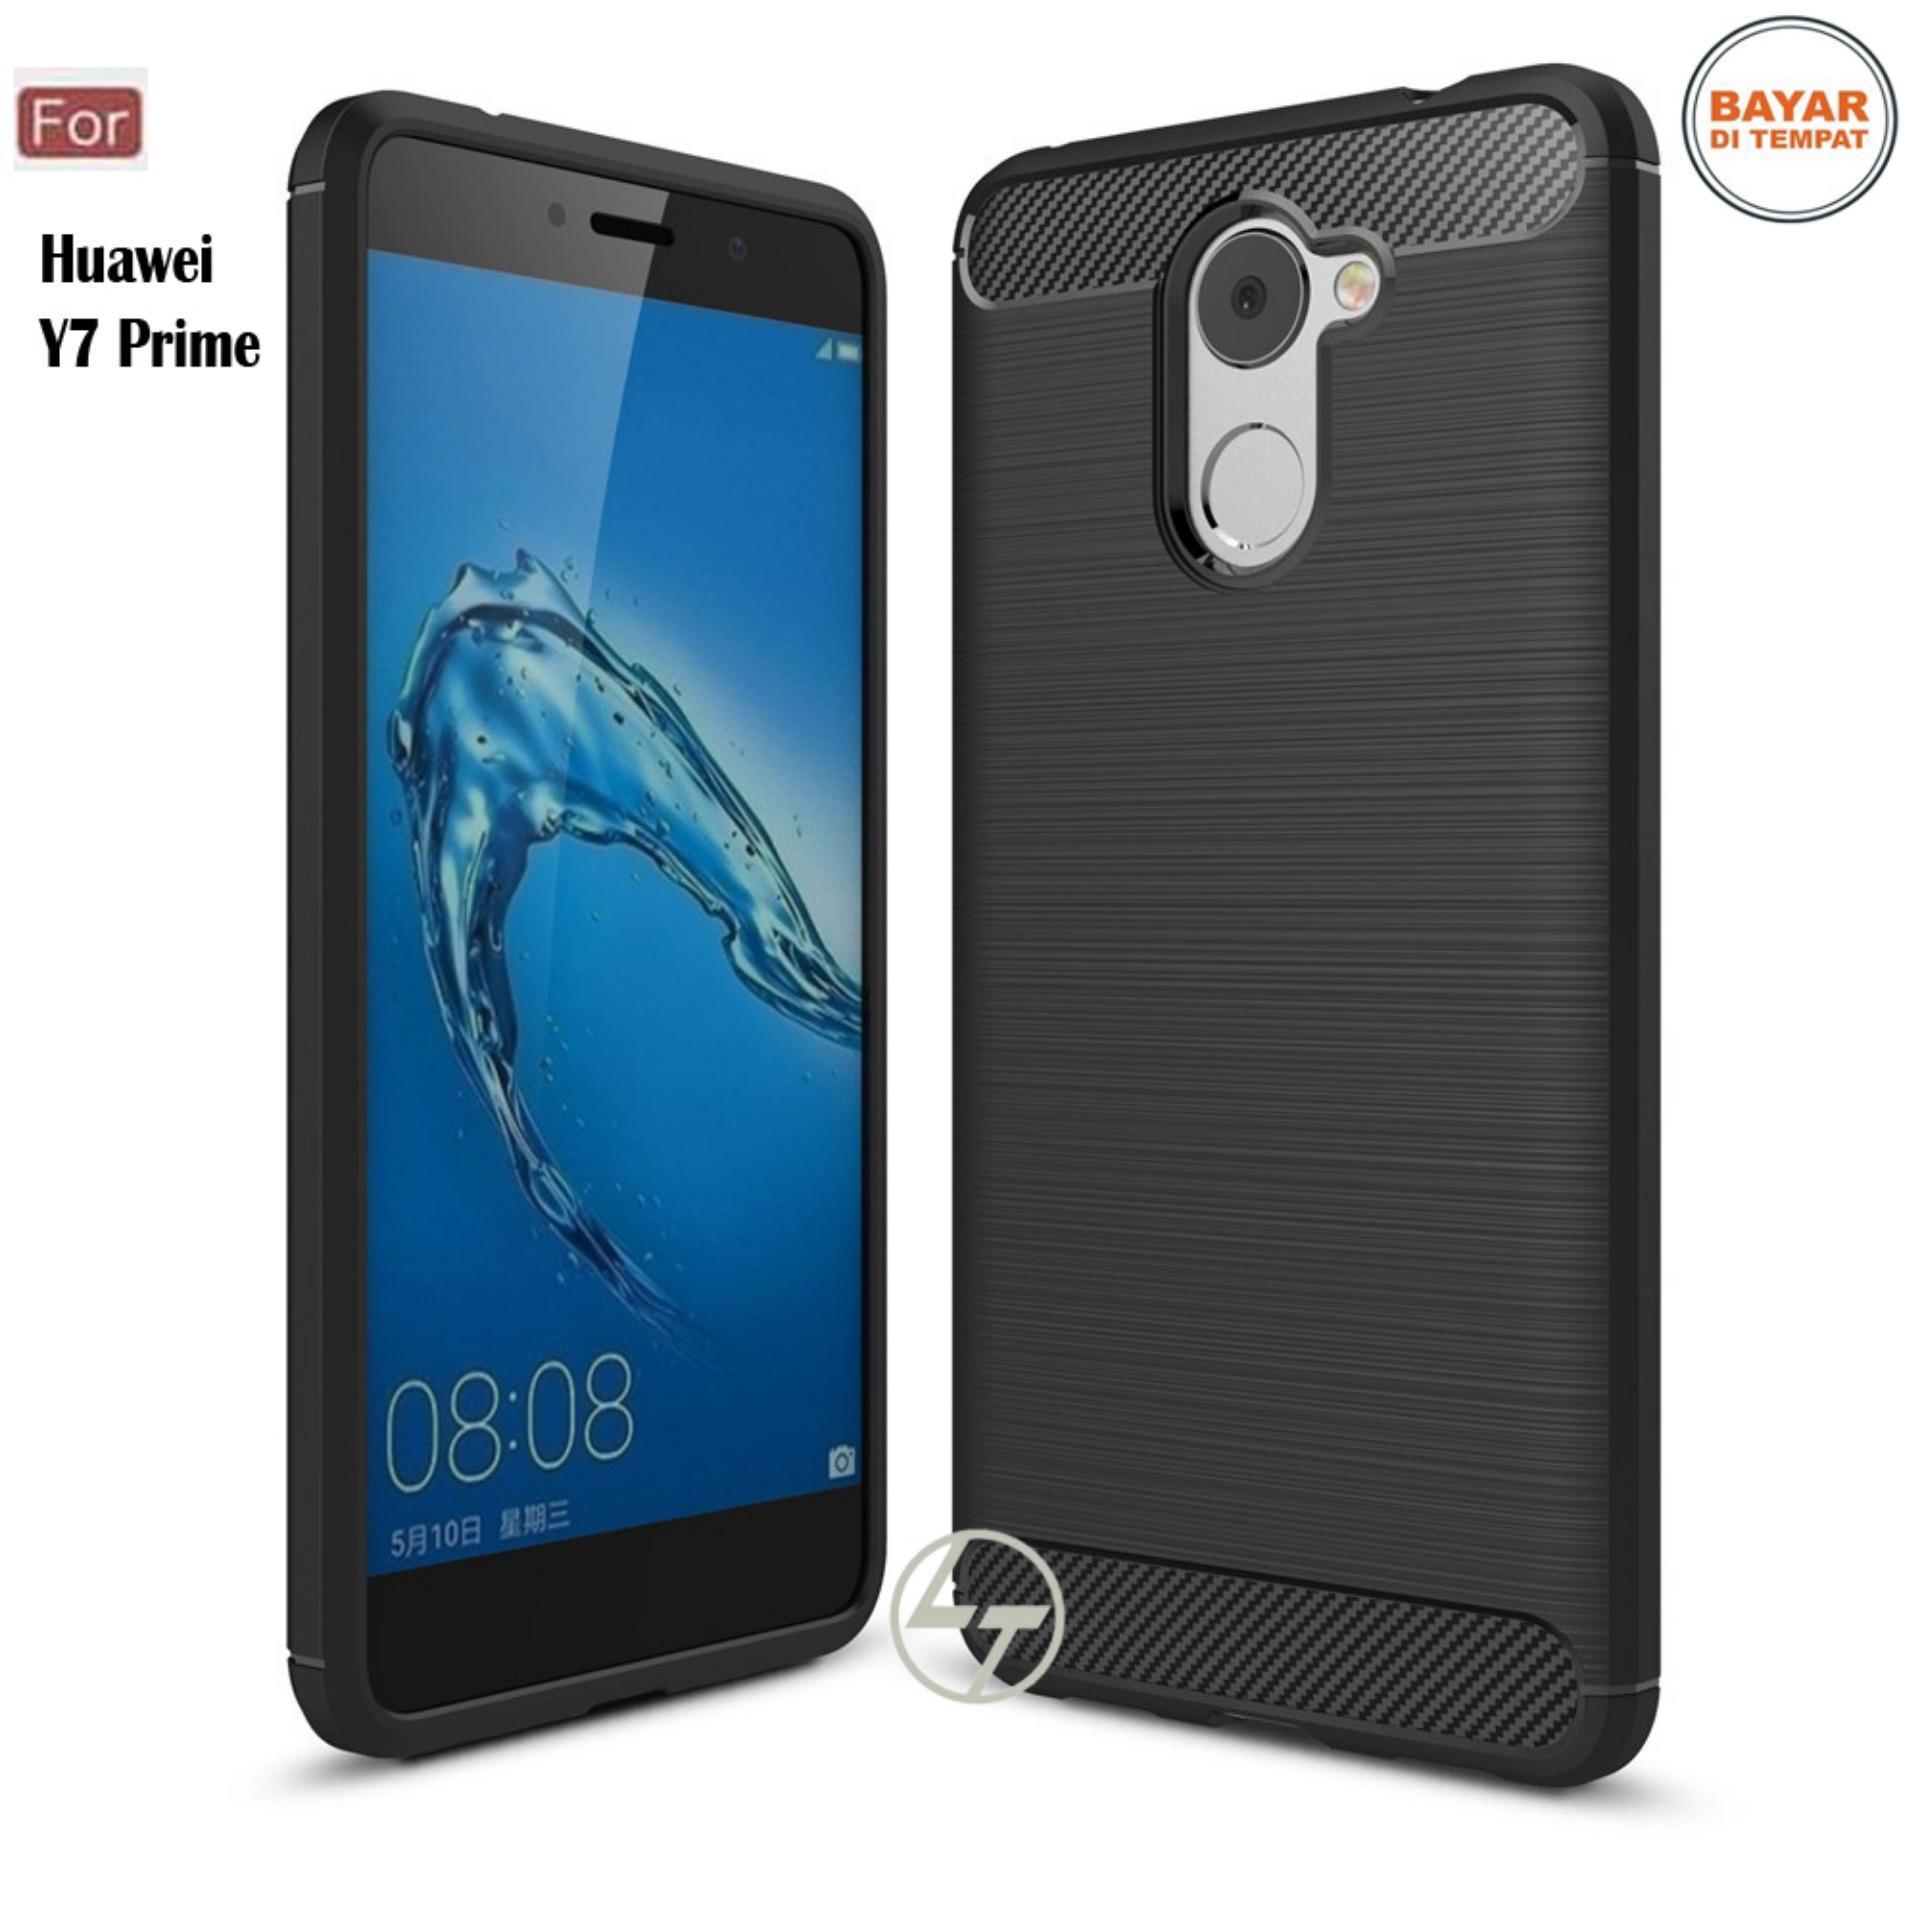 Lapak Case Carbon Fiber Premium Quality Shockproof TPU for Huawei Y7 Prime - Hitam